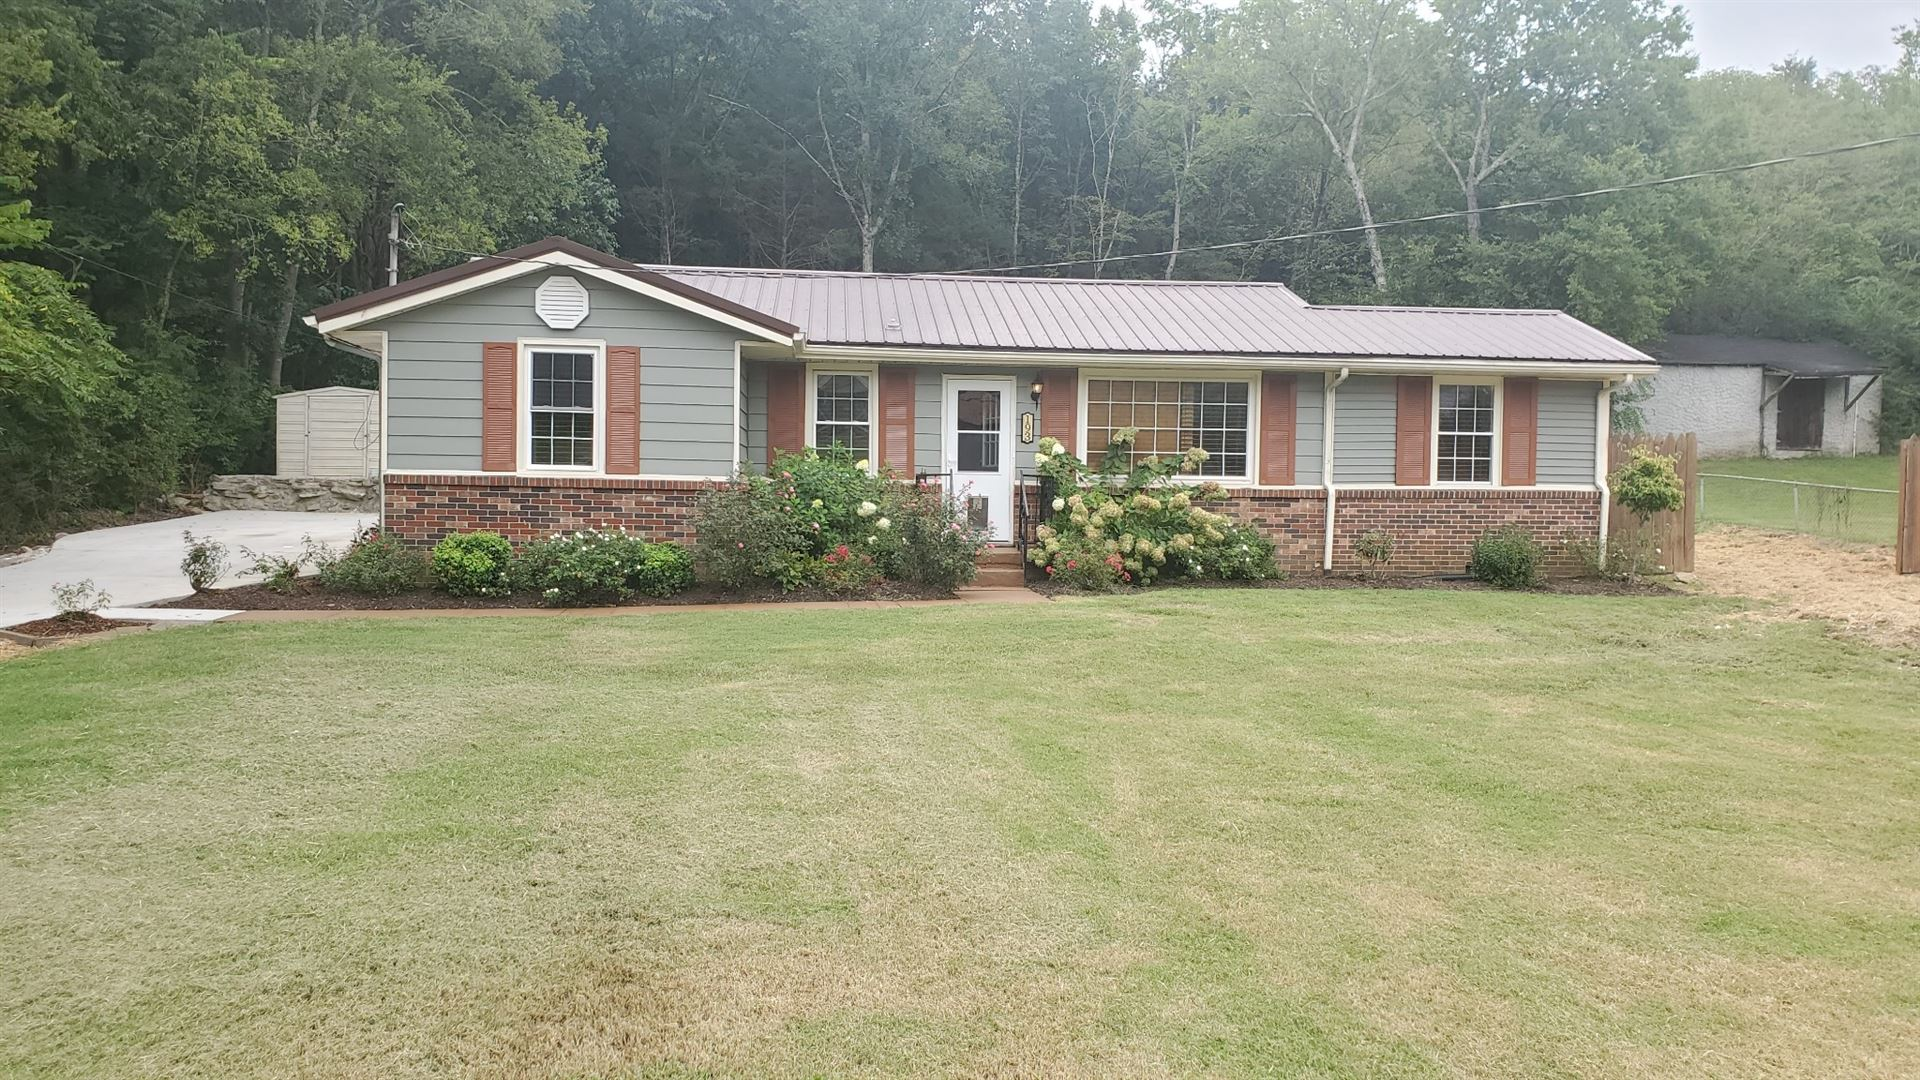 193 Old Carters Creek Pike, Franklin, TN 37064 - MLS#: 2190971